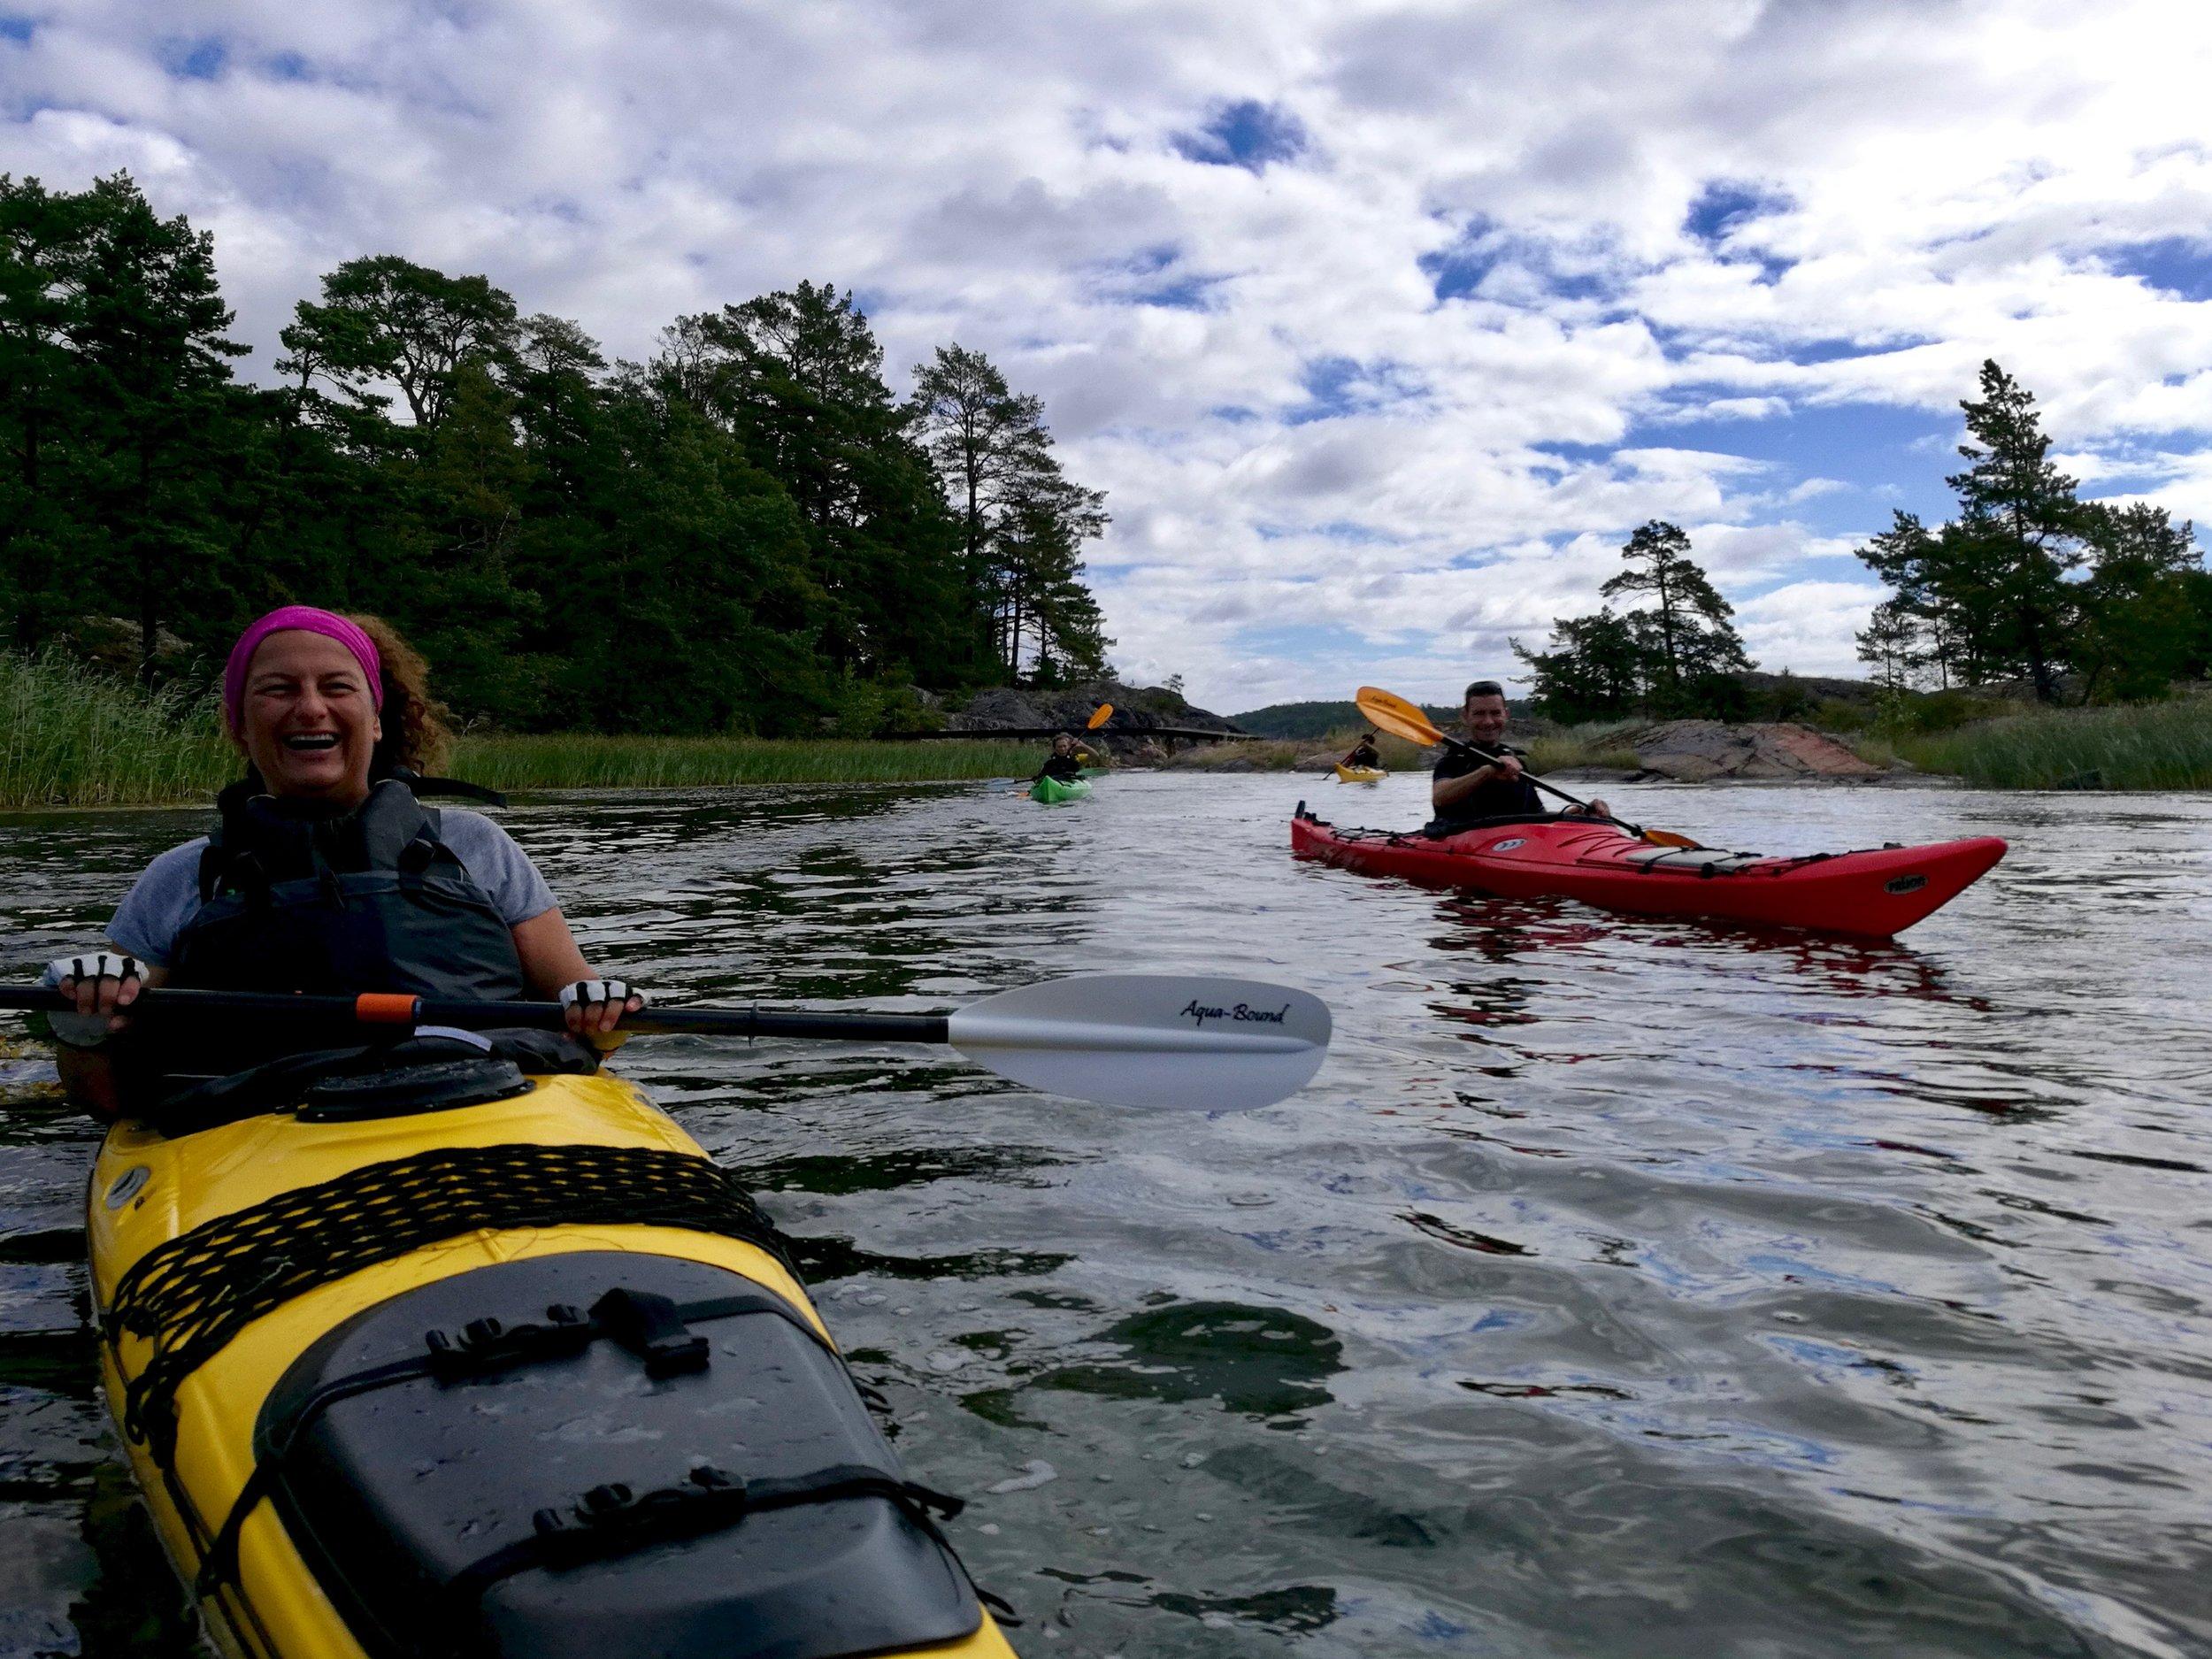 Stockholm Archipelago Kayaking 1 day 7